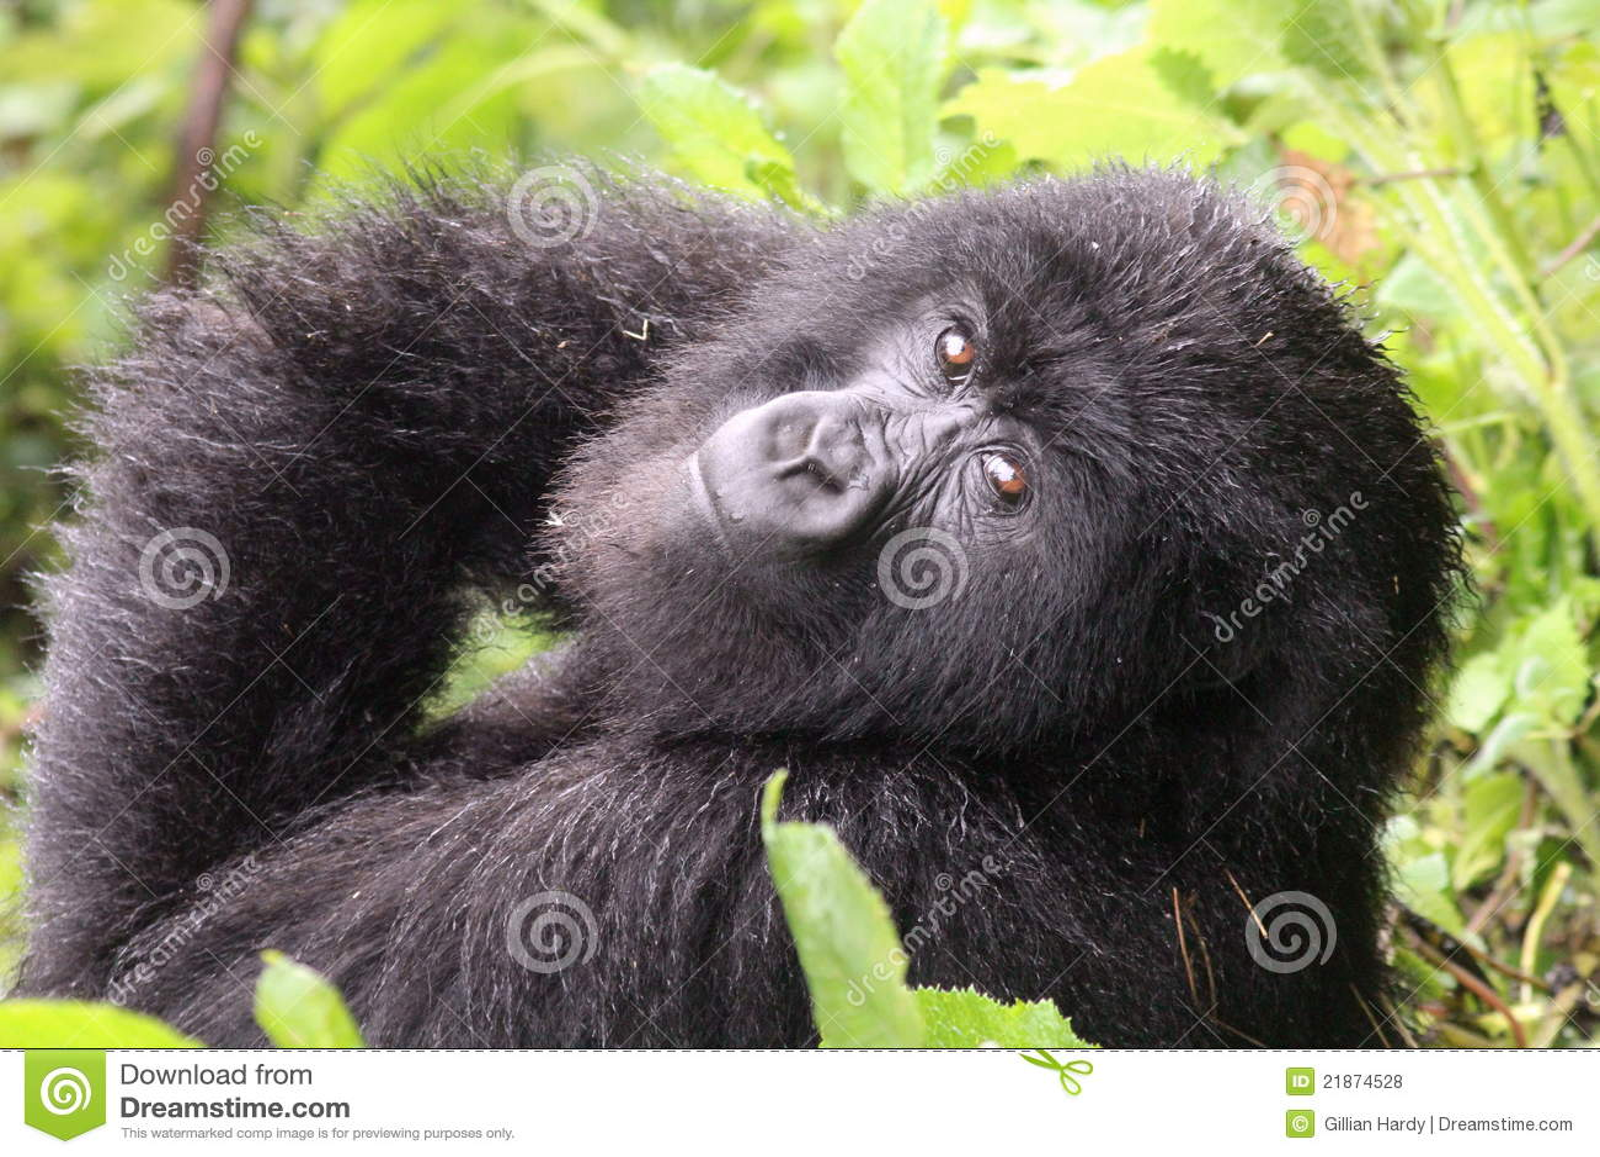 Small Mountain Gorilla